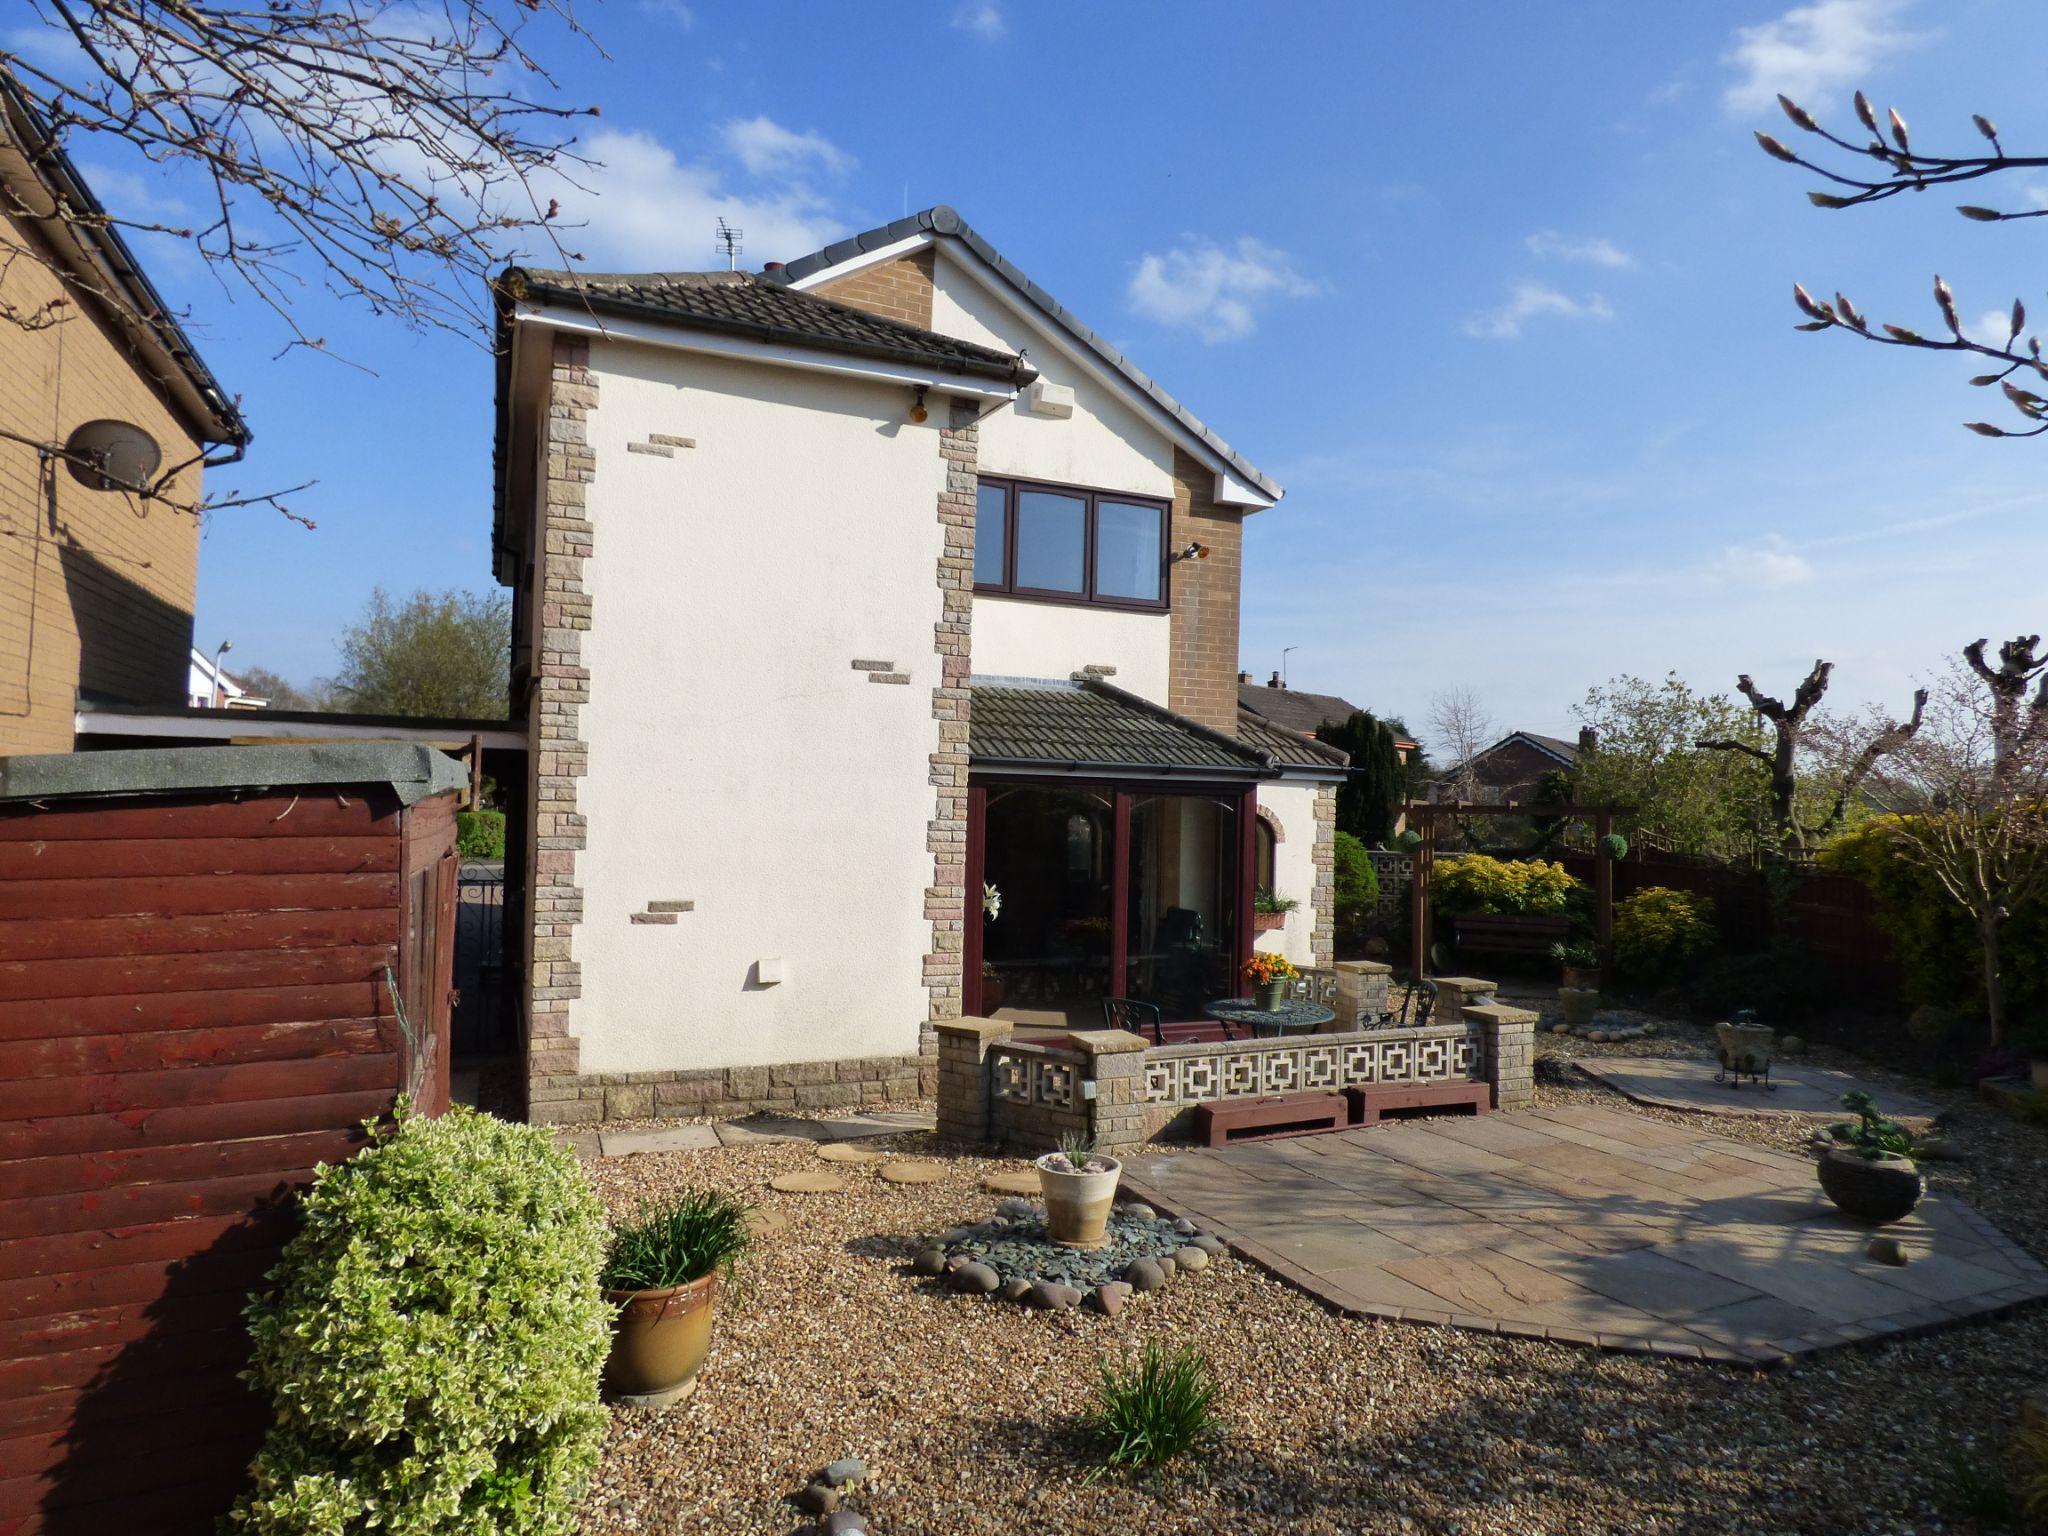 3 Bedroom Detached House For Sale - Rear Elevation Extension